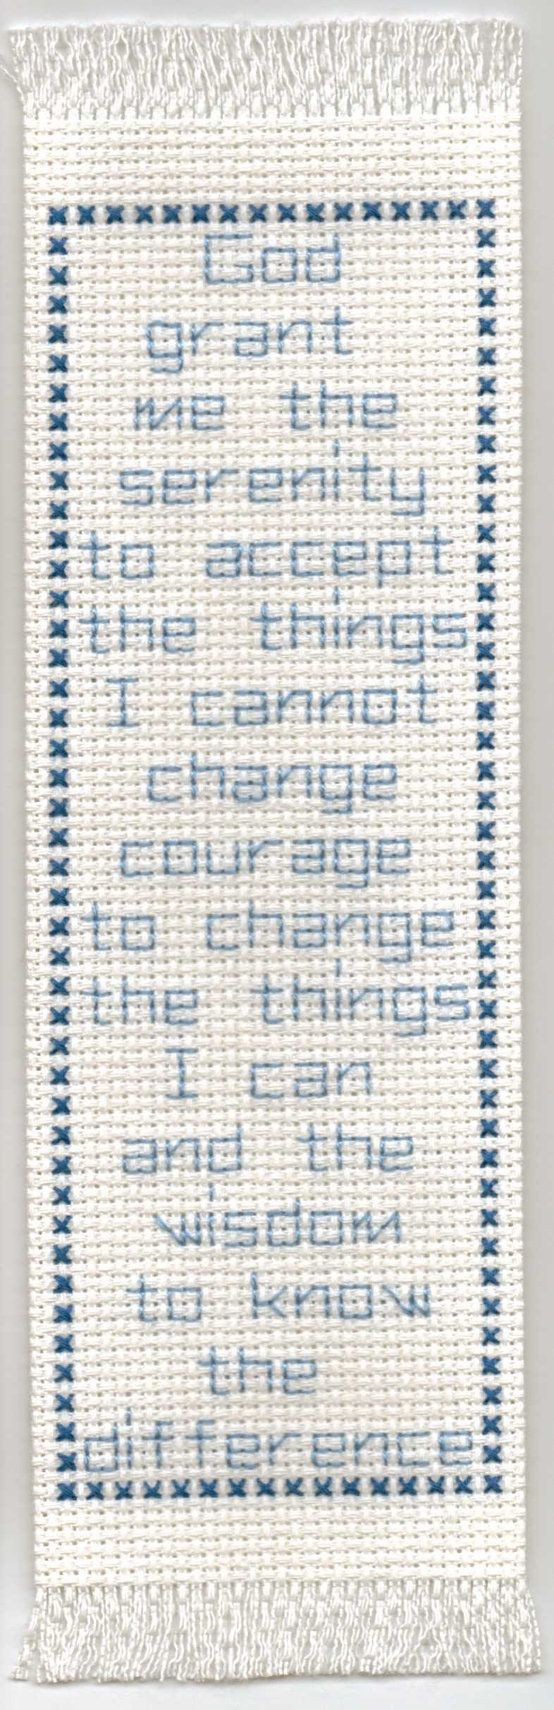 Blue Serenity Prayer Cross Stitched Bookmark by alwaysandforever99, $3.00